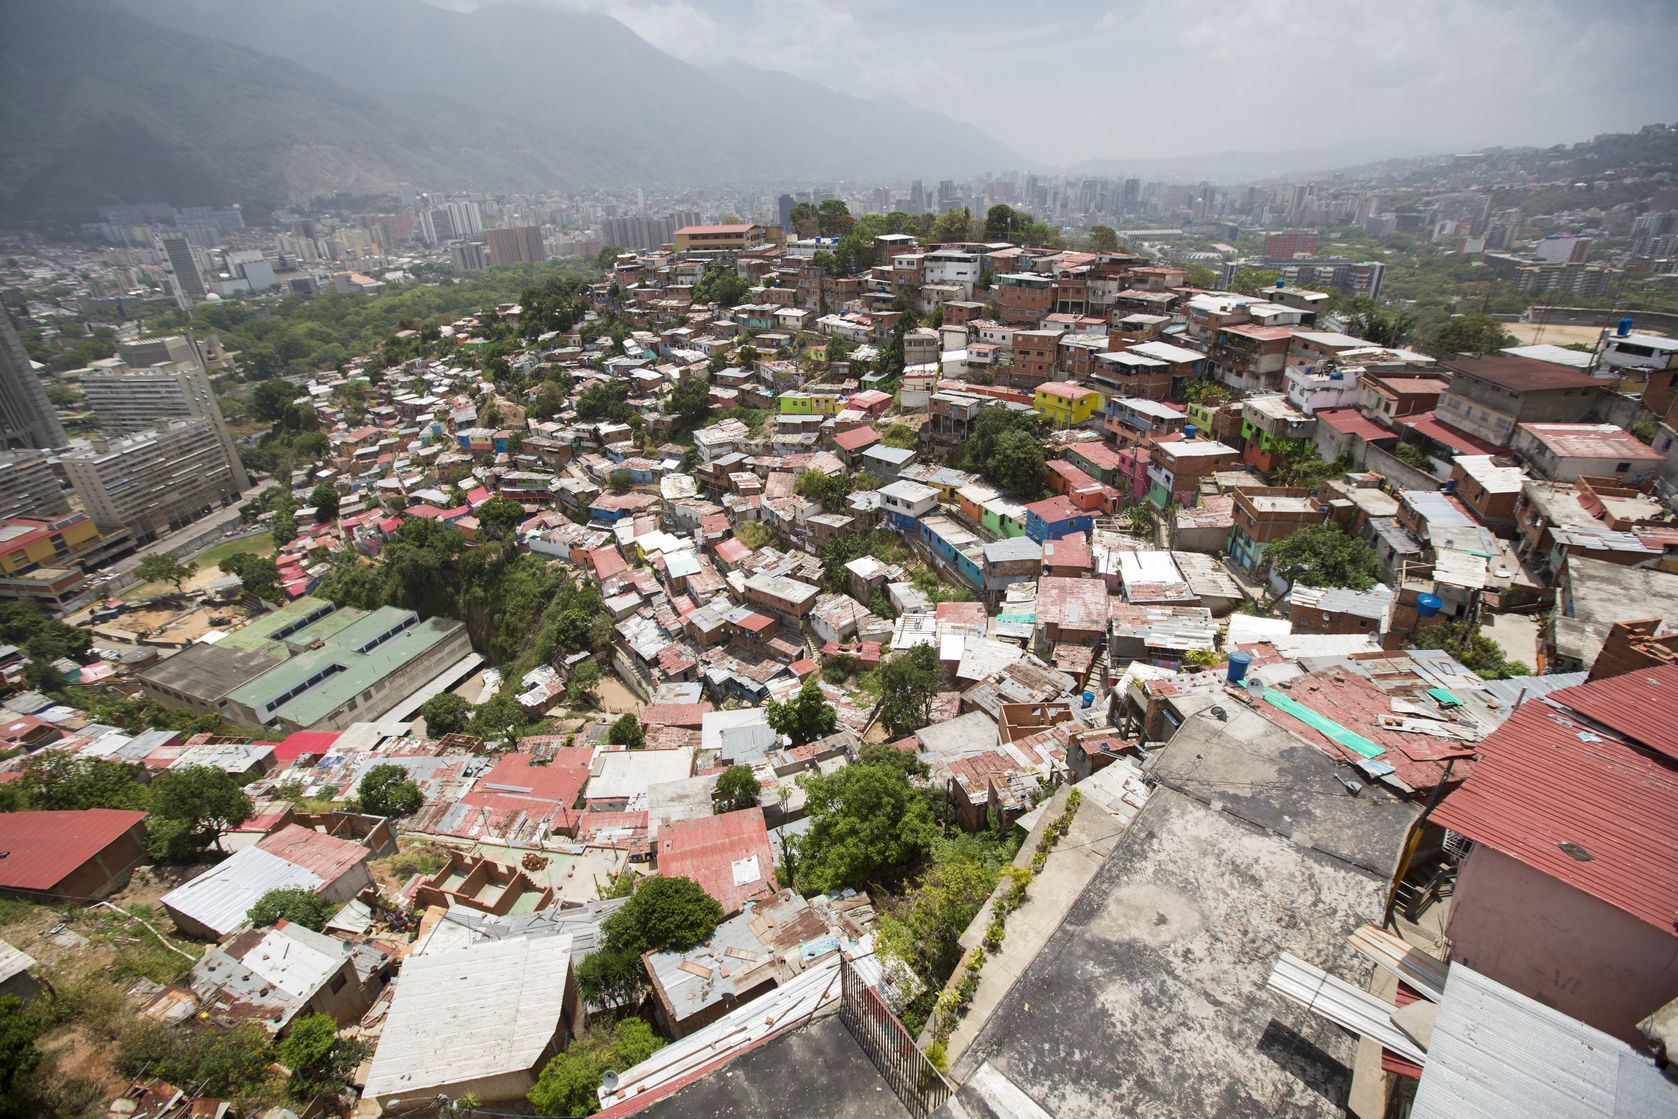 Domky v Caracasu ve Venezuele   piccaya/123RF.com